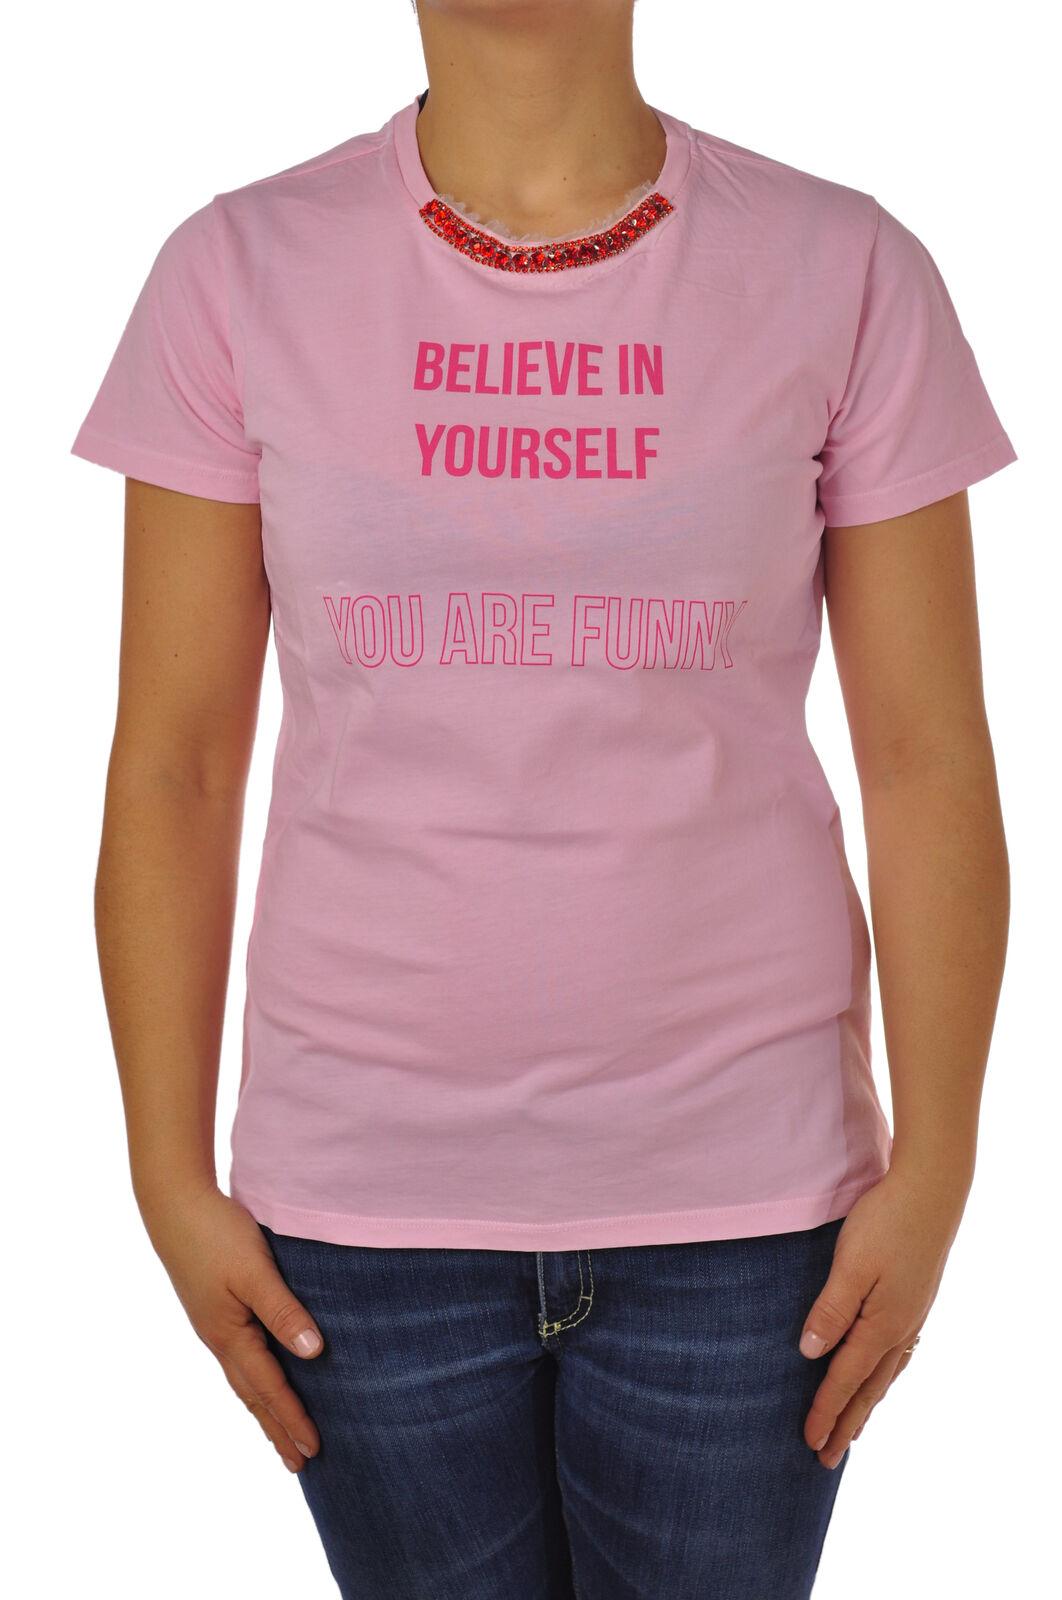 Pinko - Topwear-T-shirts - Woman - Pink - 4775813F181005